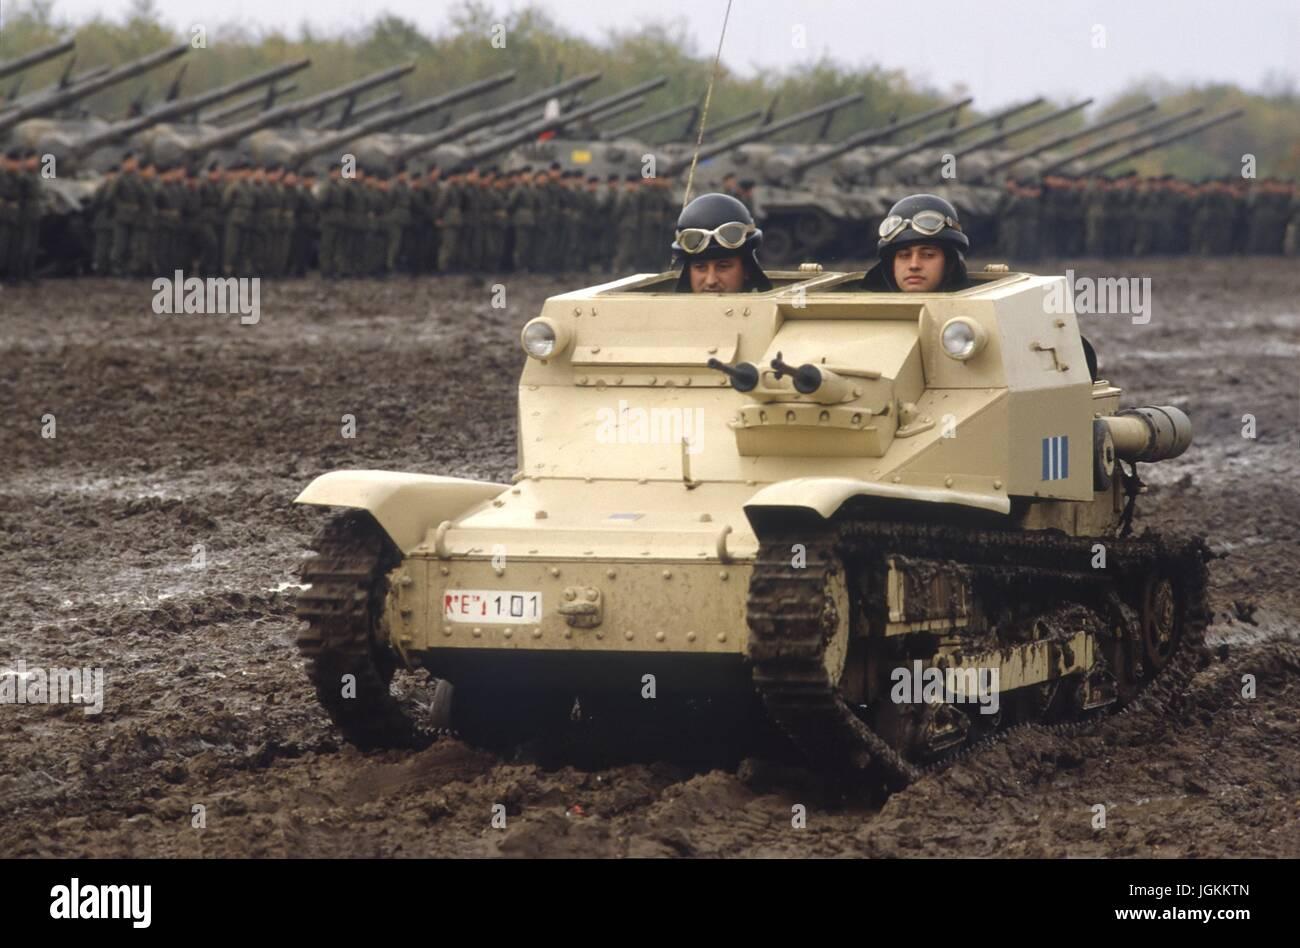 Italian army l3 35 light tank of world war ii stock photo italian army l3 35 light tank of world war ii sciox Images